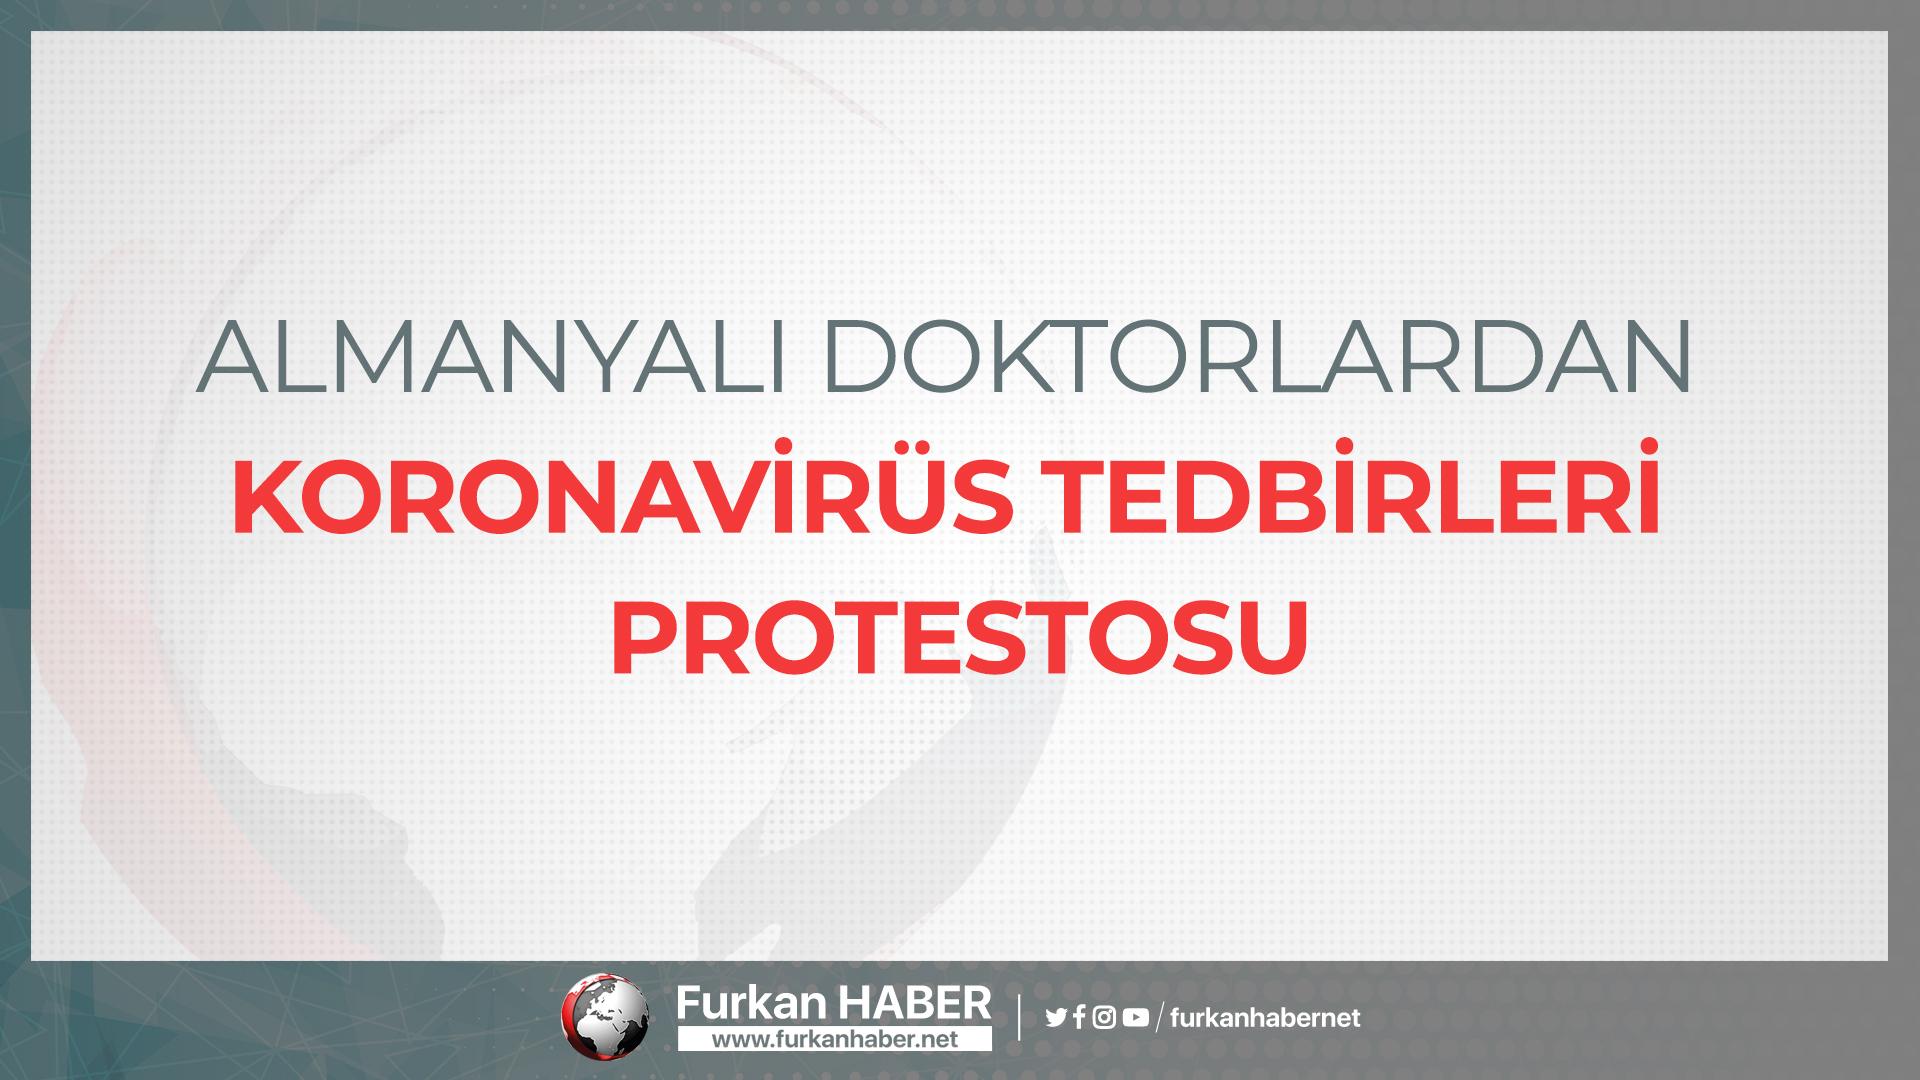 Almanyalı Doktorlardan Koronavirüs Tedbirleri Protestosu